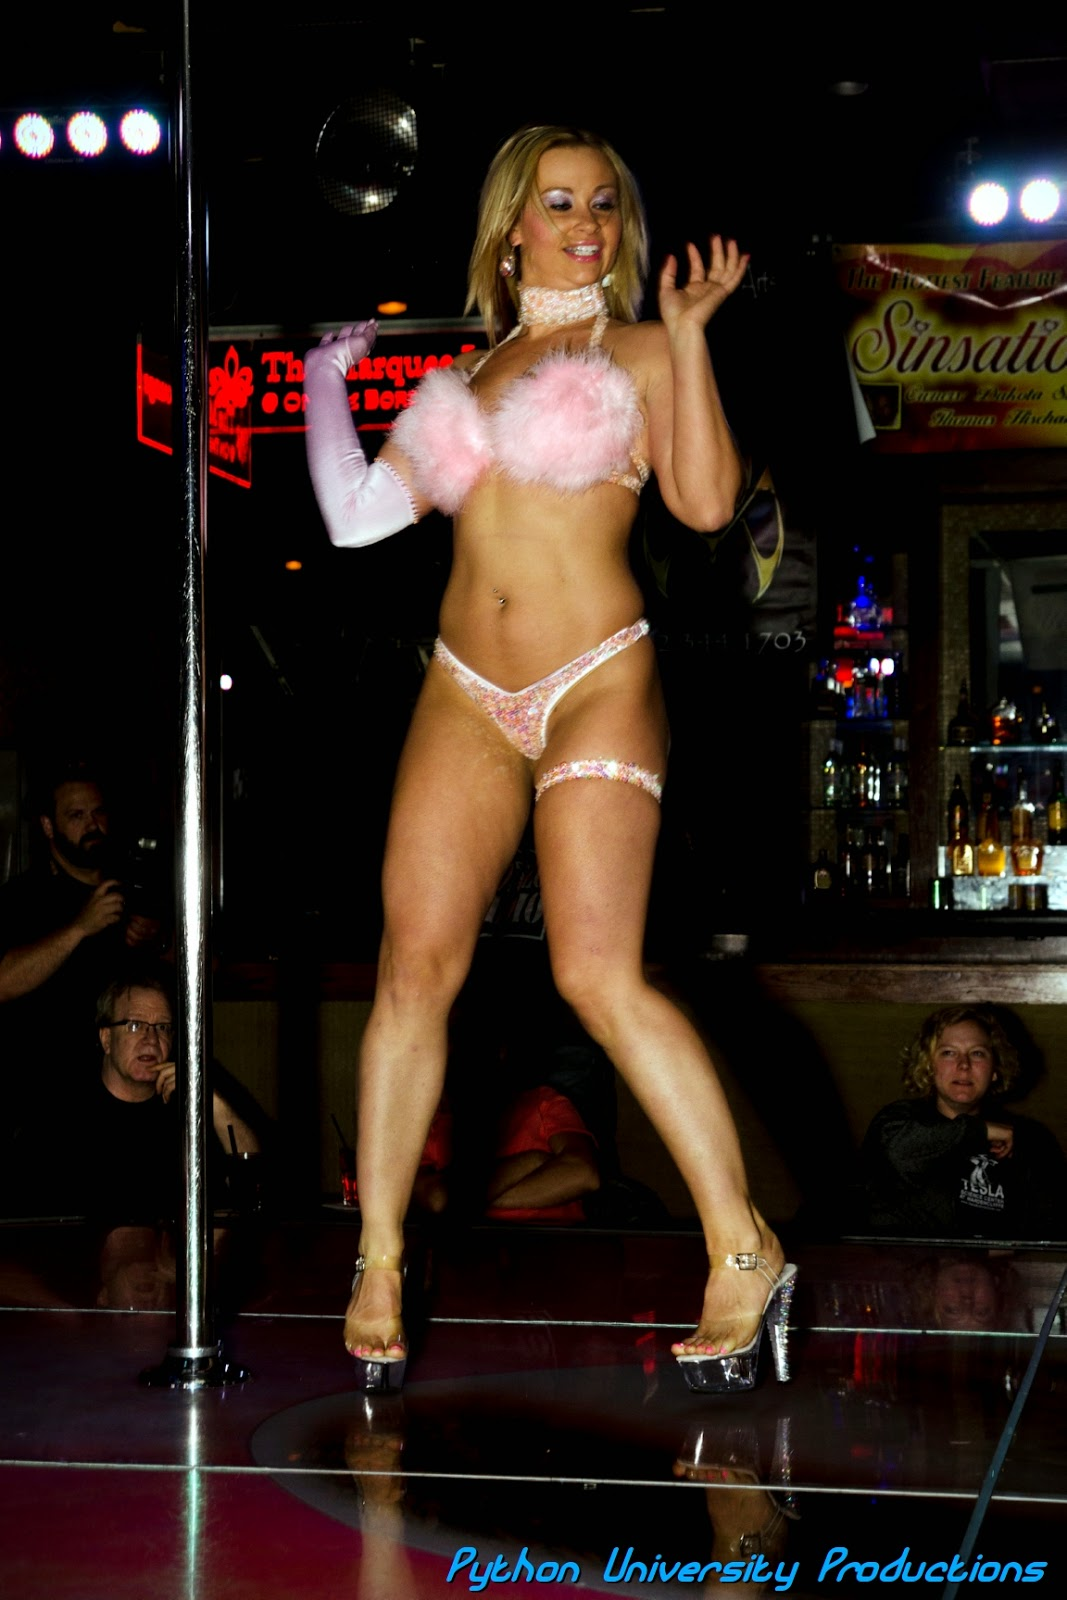 Déjà Vu Showgirls Lansing 3-4-1 Dances